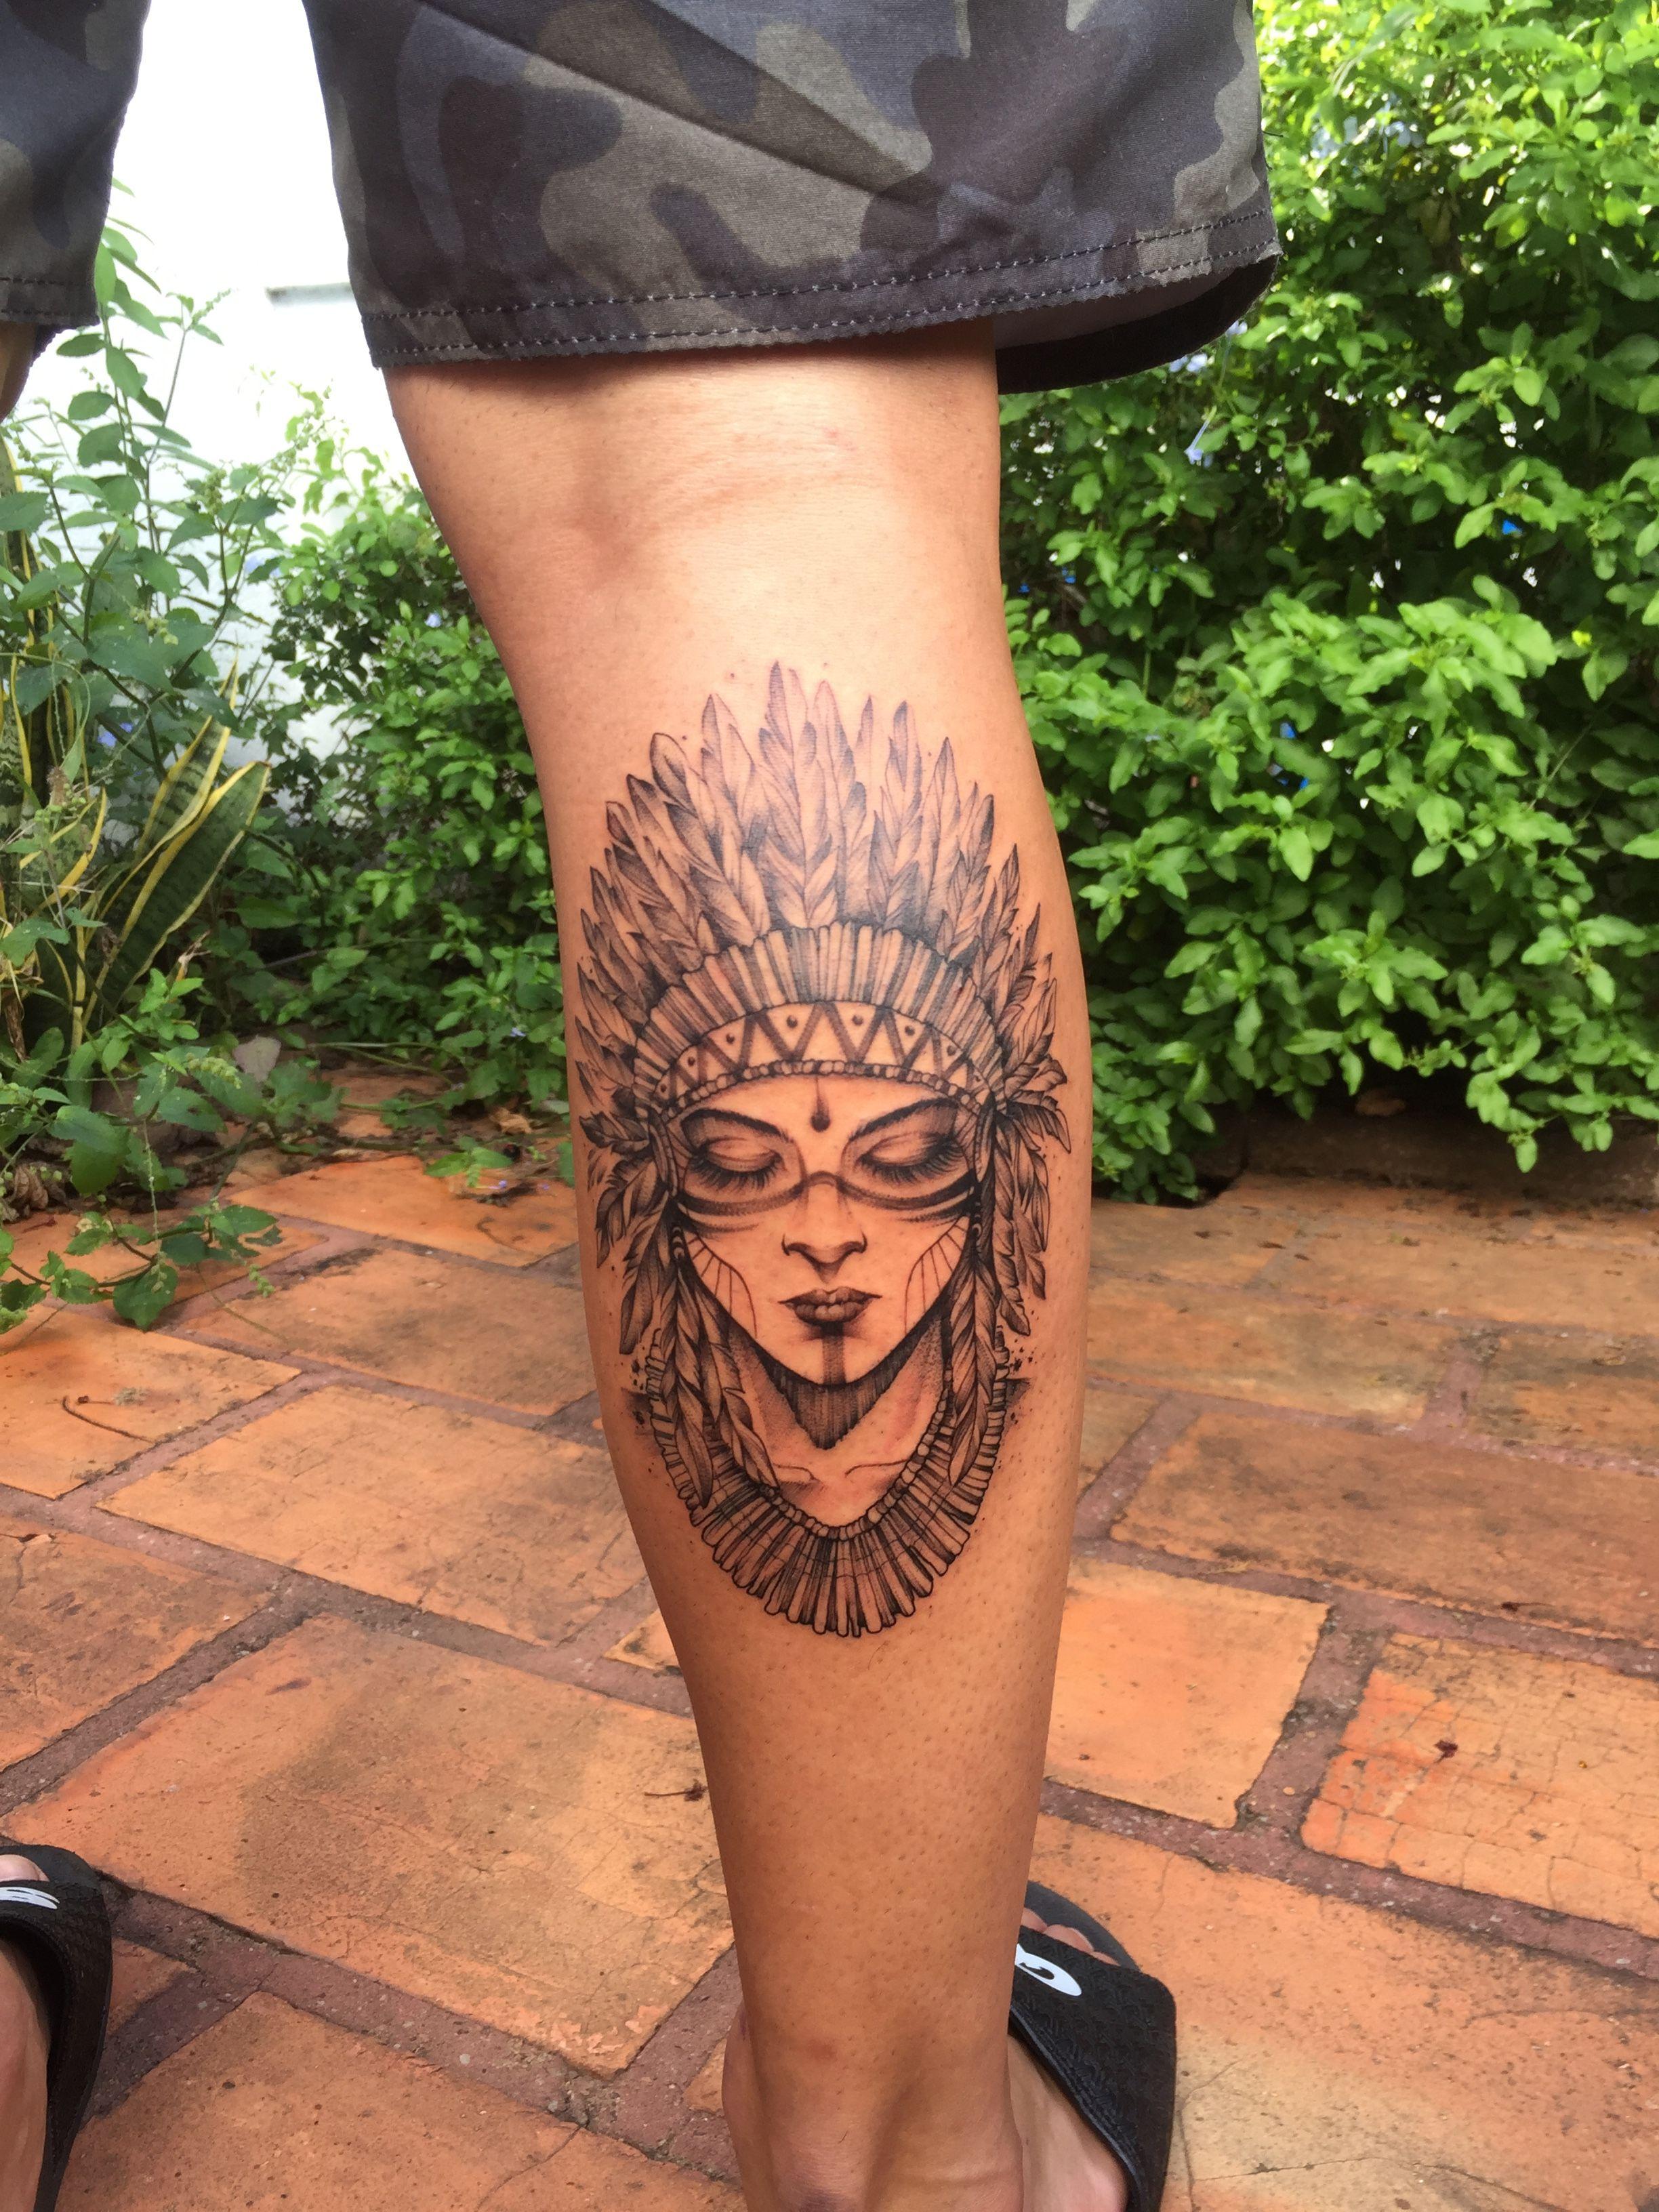 Tattoo India Tatuagem Tatuagemnapanturilha Tatuagem